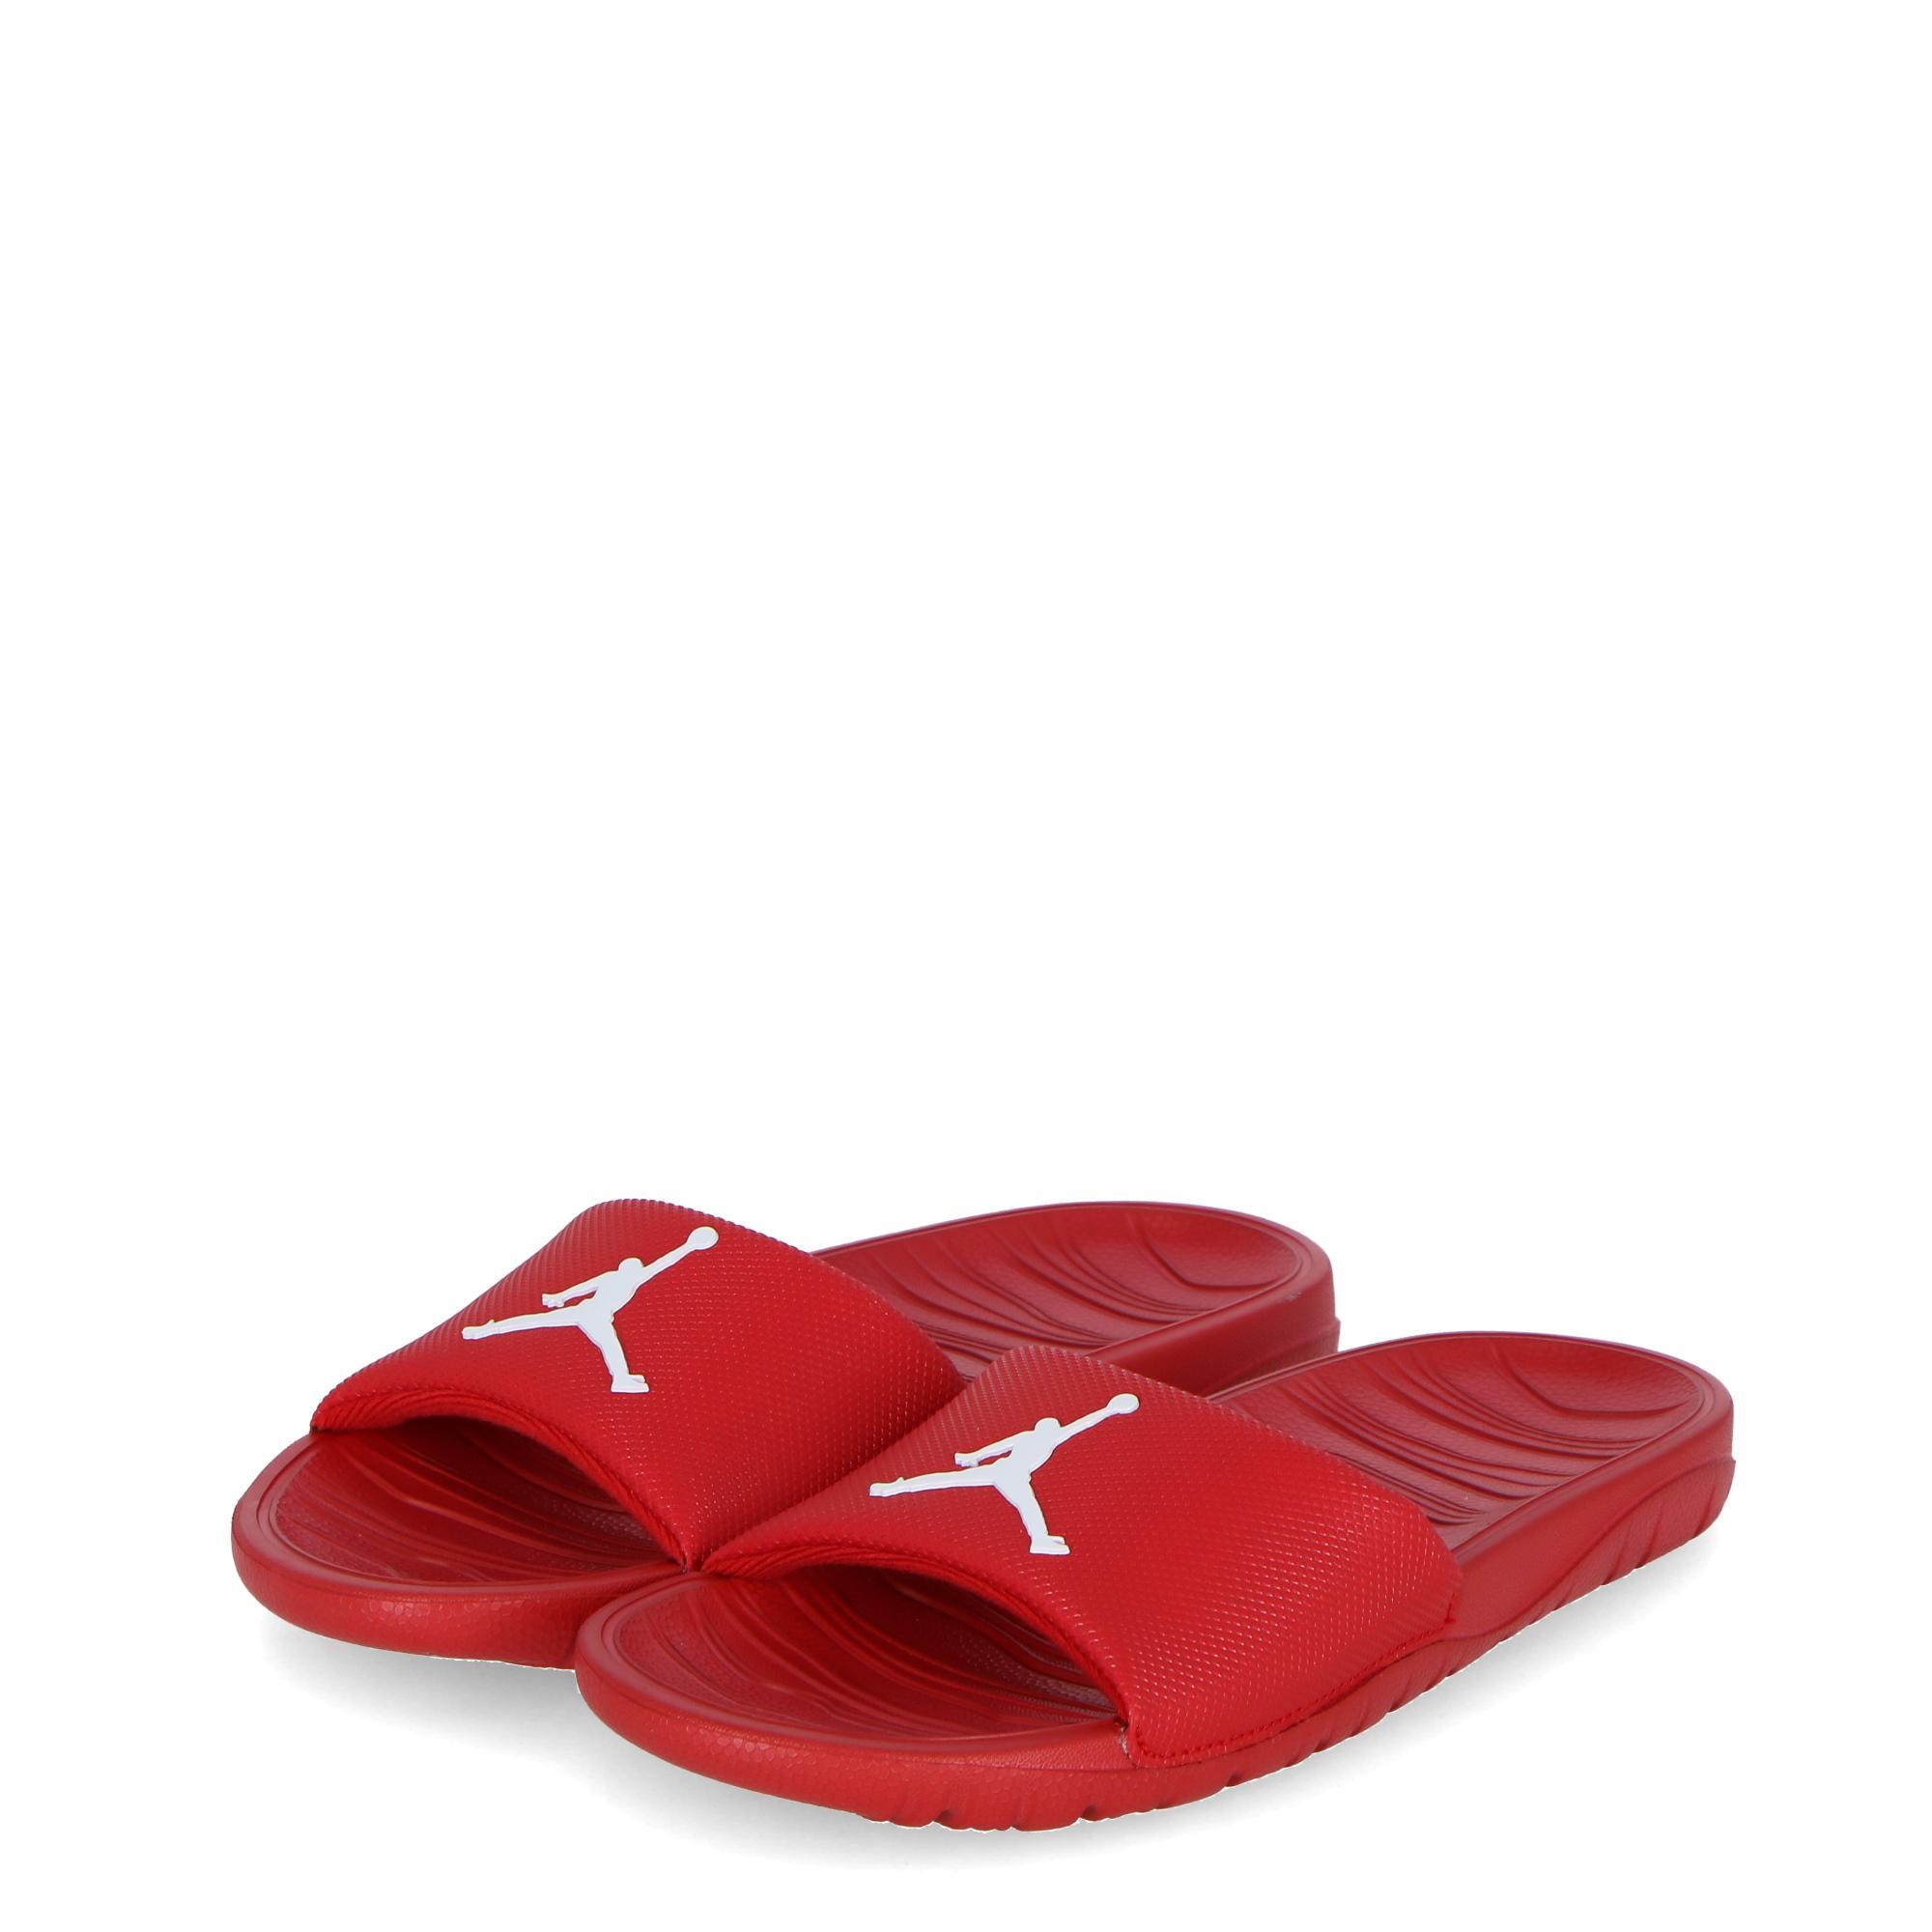 sports shoes 94029 97bcb JORDAN BREAK SLIDE